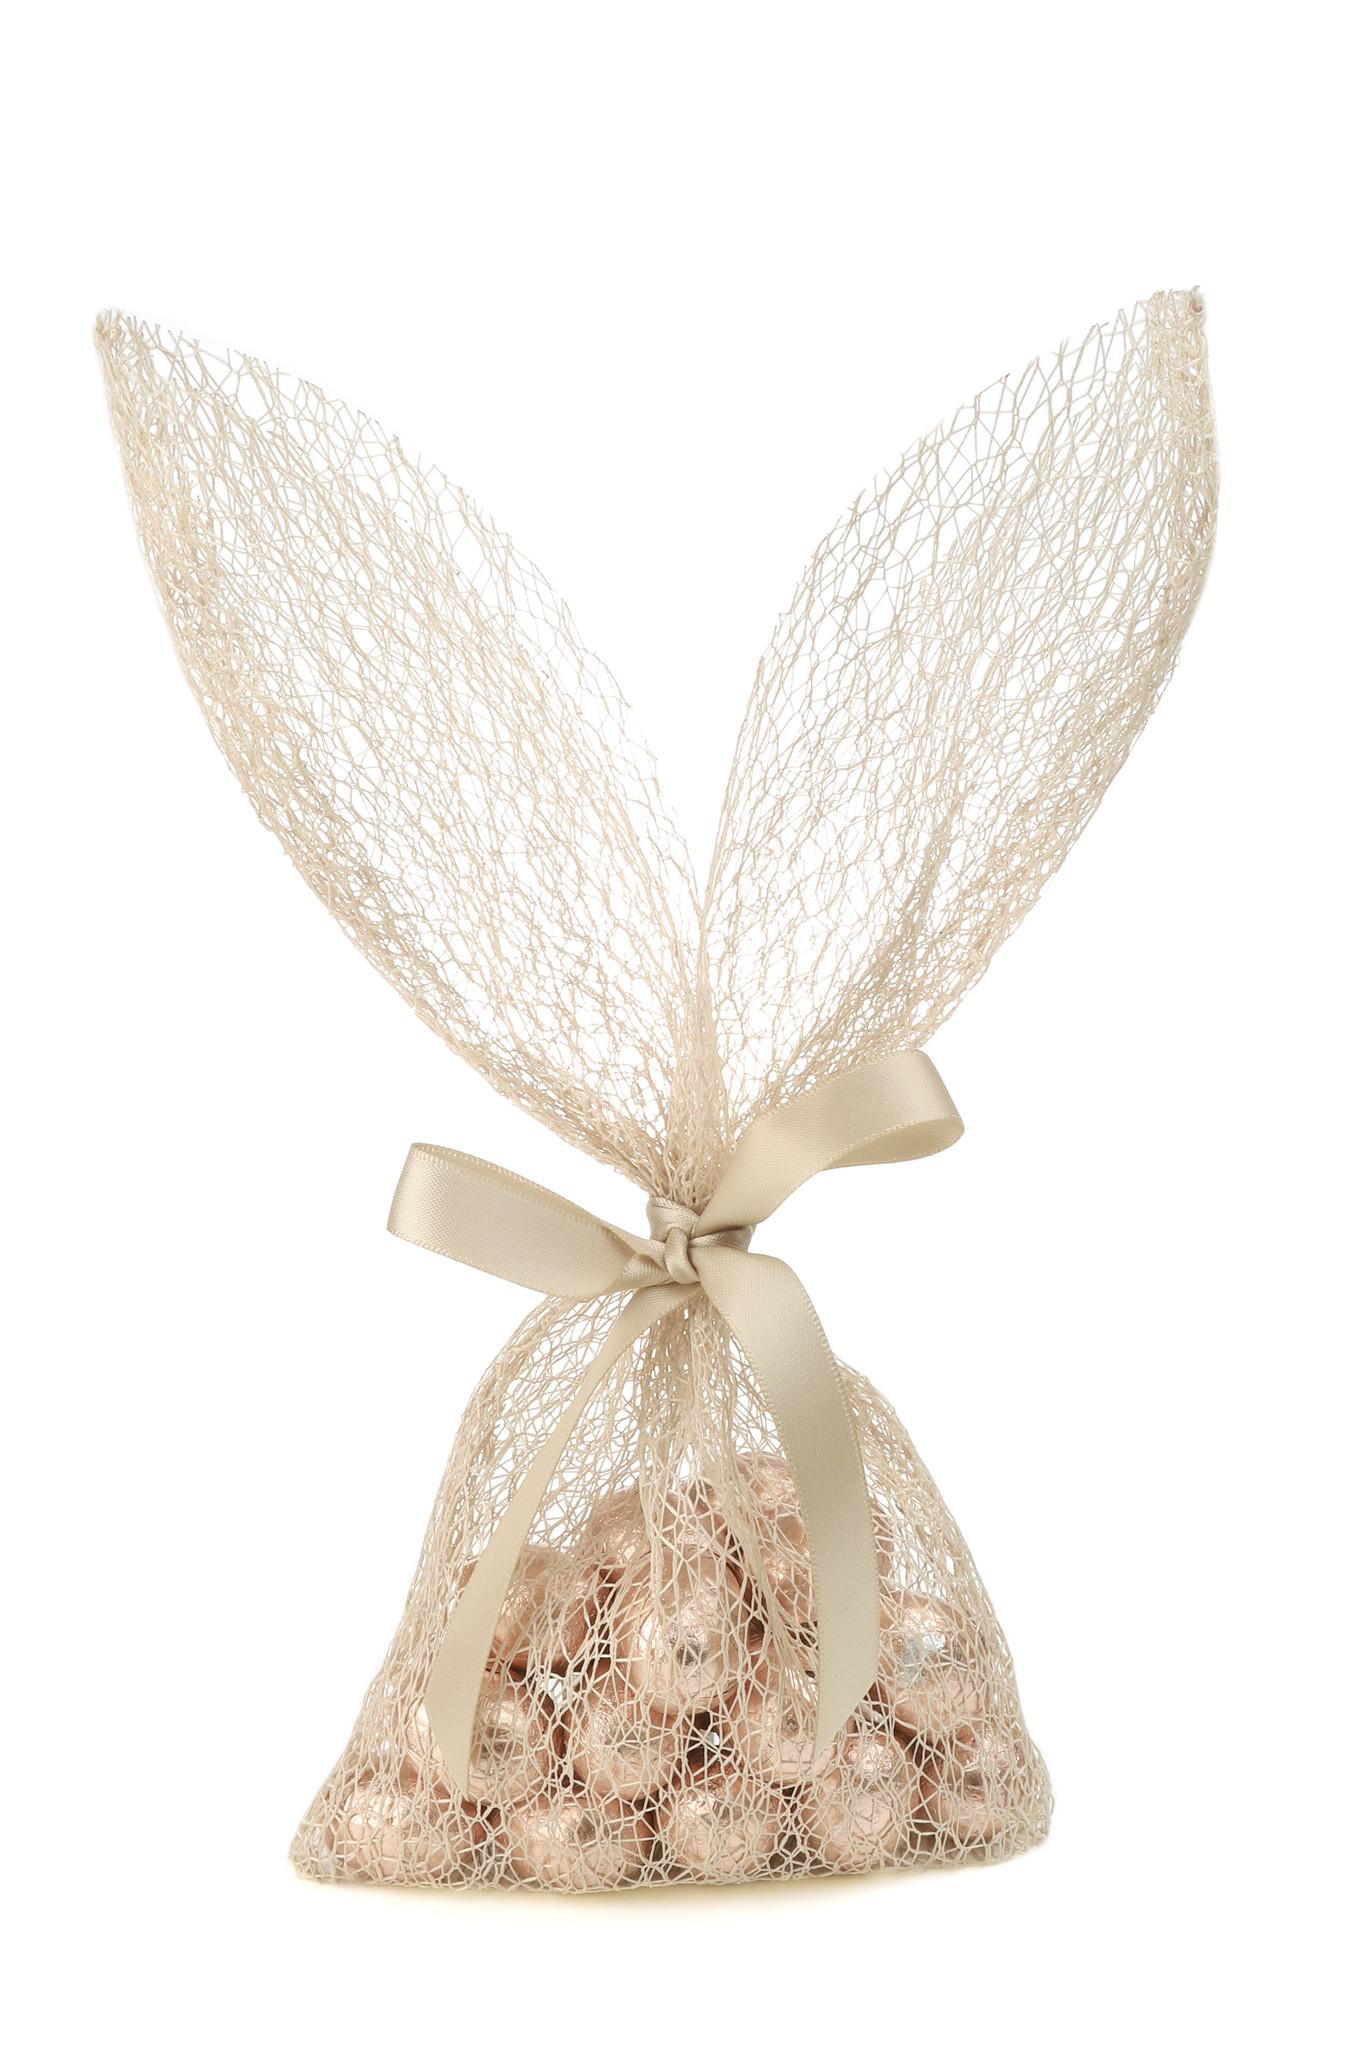 Bunny Bag  crispy - Sand  - 5 pieces